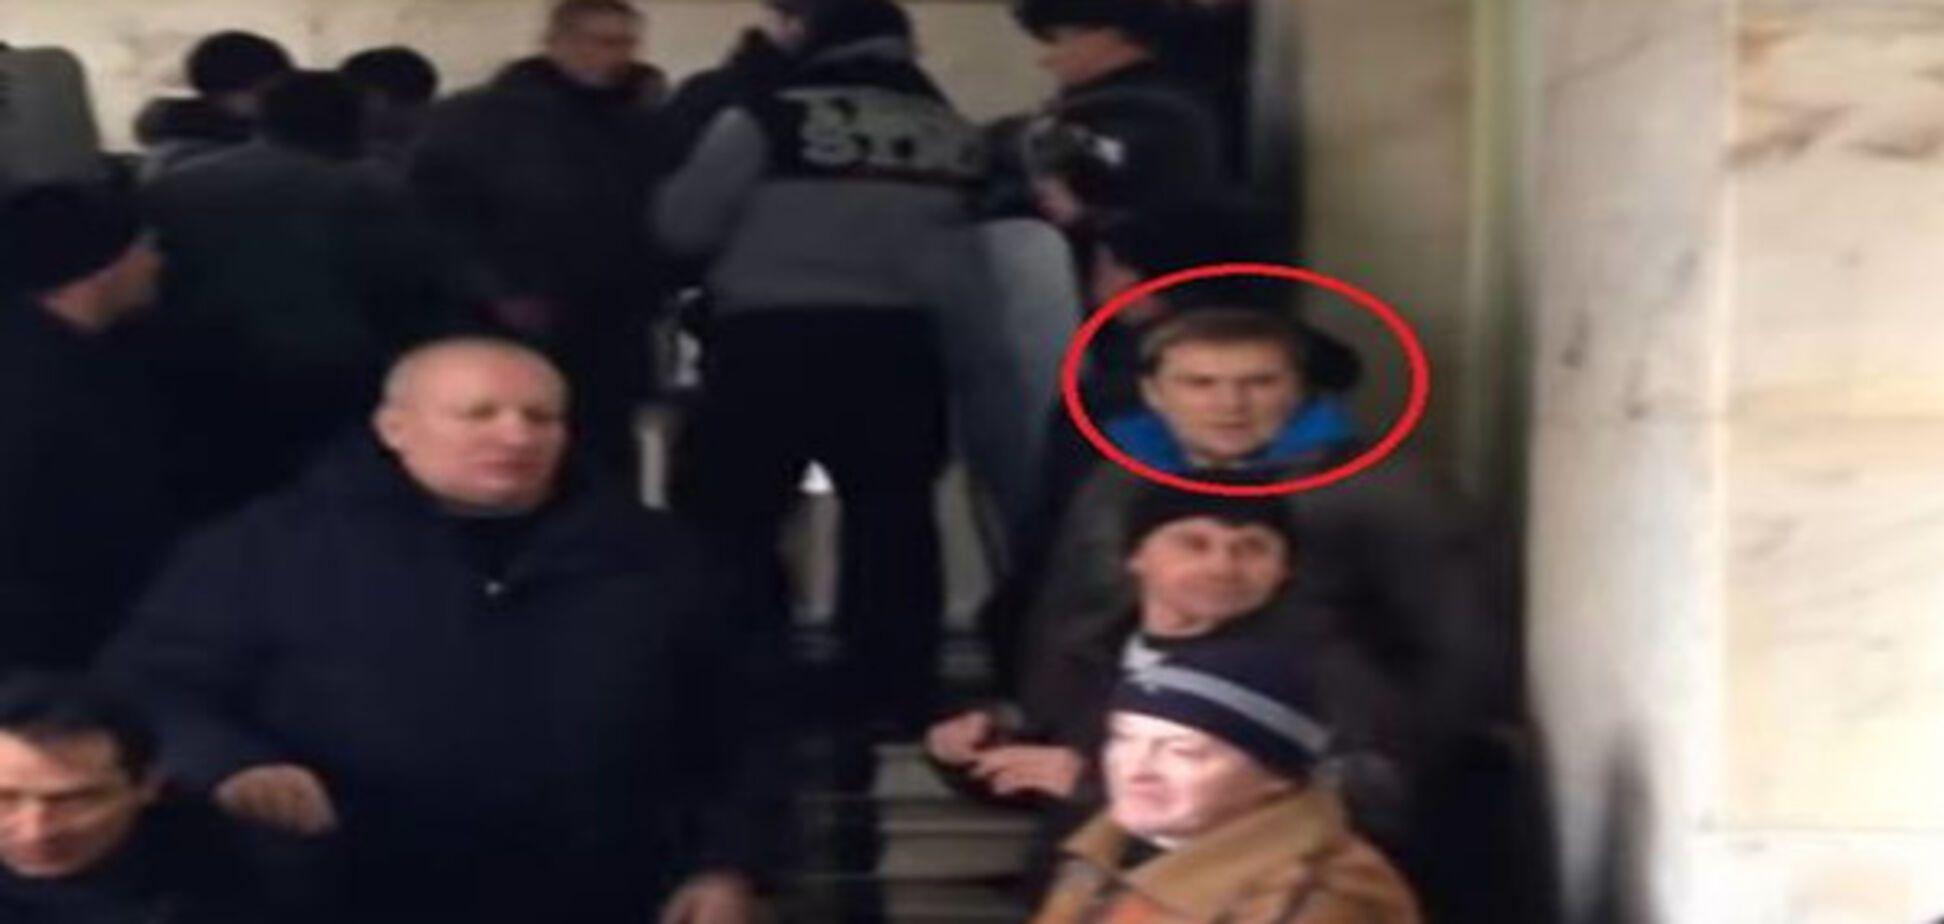 Скандал: зама Авакова увидели на компрометирующем видео